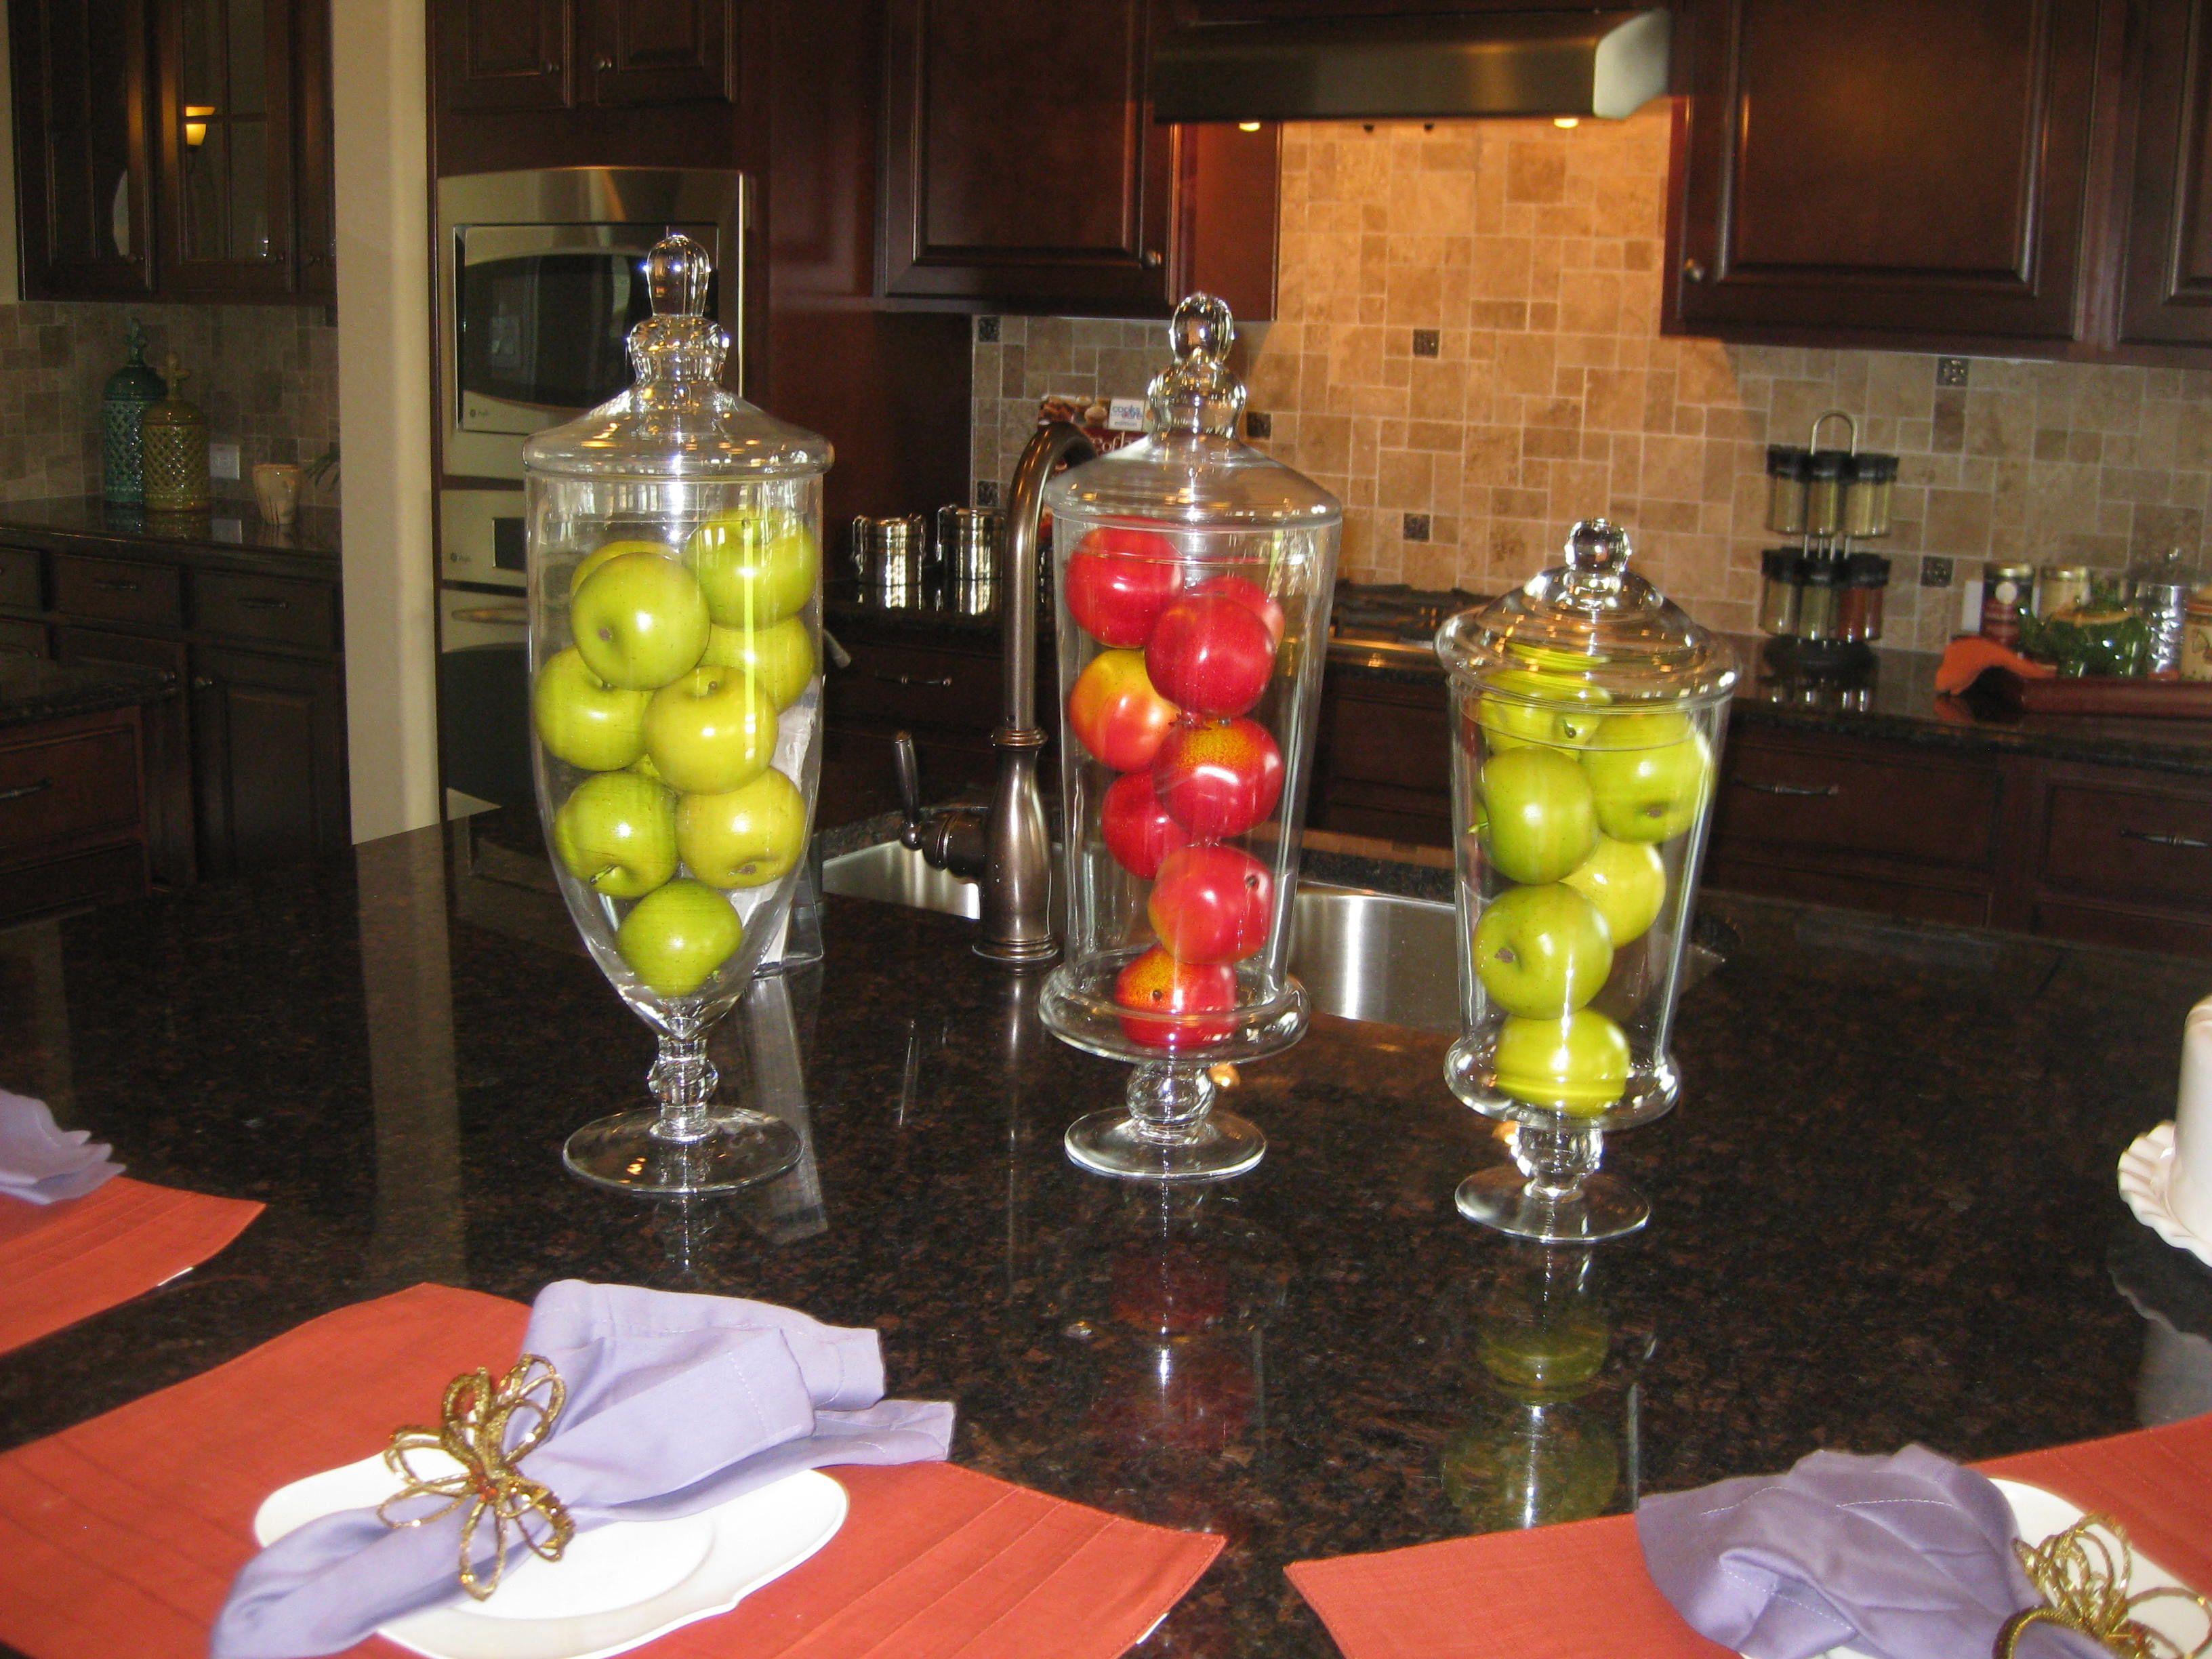 Fruit vases decorating pinterest vases decor - Kitchen curtains with fruit design ...